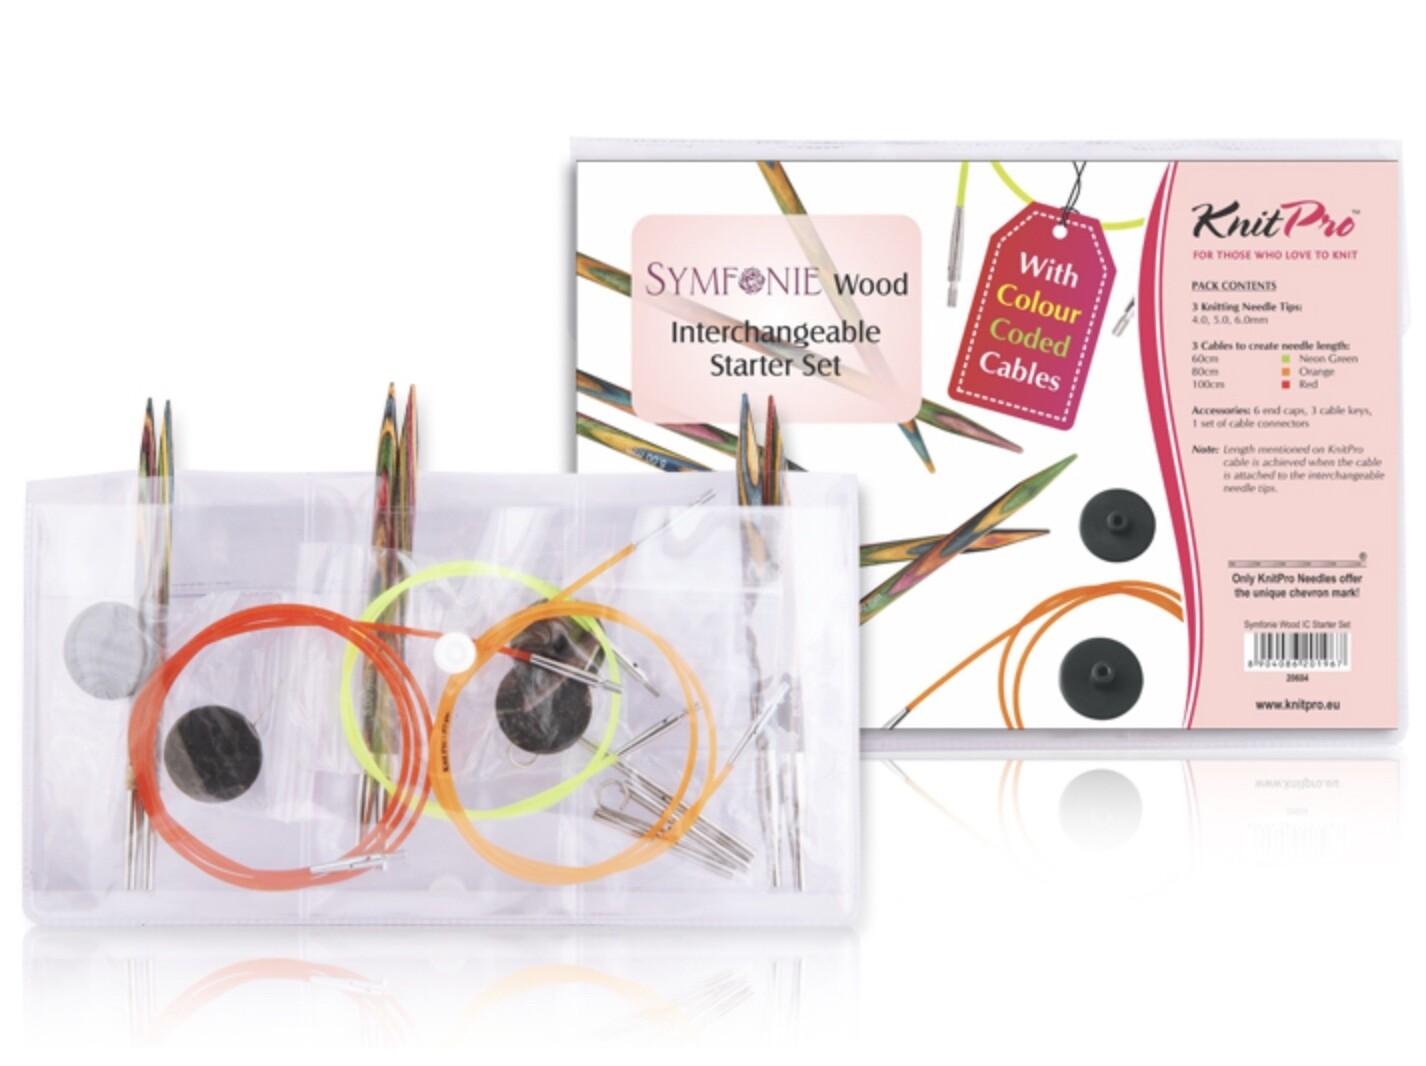 KnitPro Symfonie Starter kit - interchangeable circulars